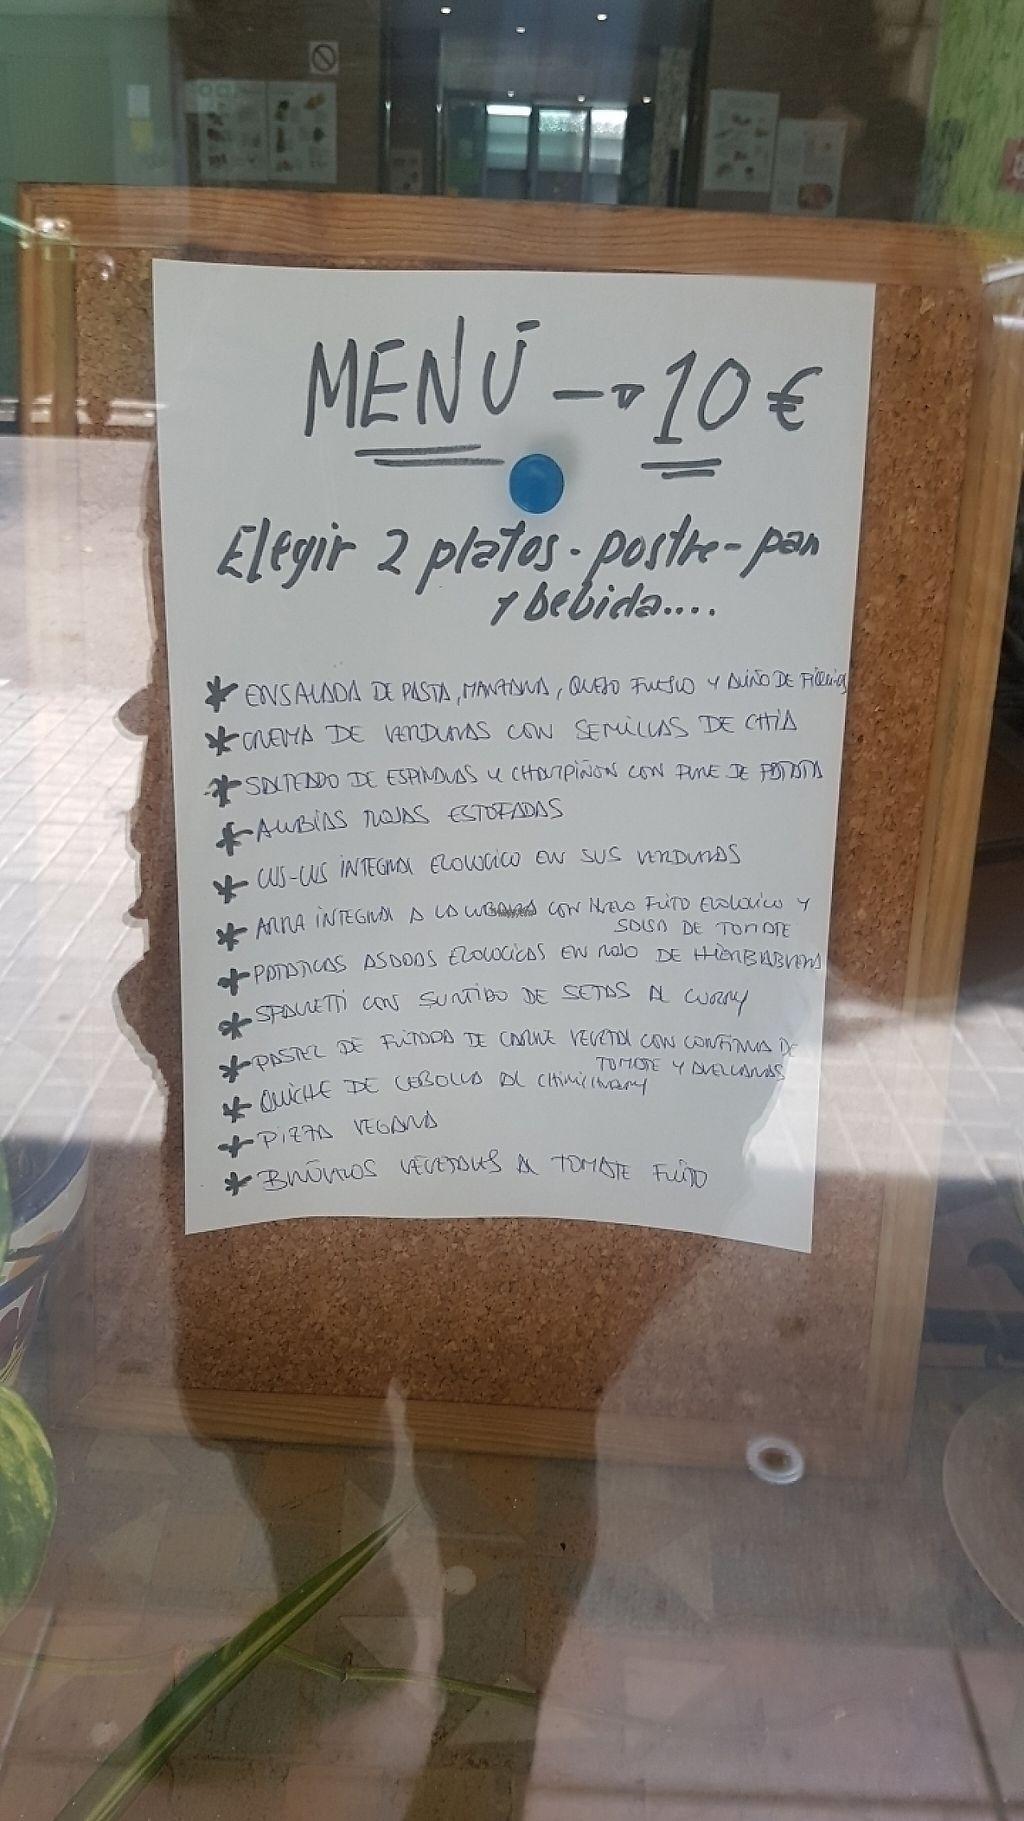 "Photo of La Olla Vegetal  by <a href=""/members/profile/Gaabs"">Gaabs</a> <br/>Menú (15-04-17) <br/> April 15, 2017  - <a href='/contact/abuse/image/17908/248331'>Report</a>"